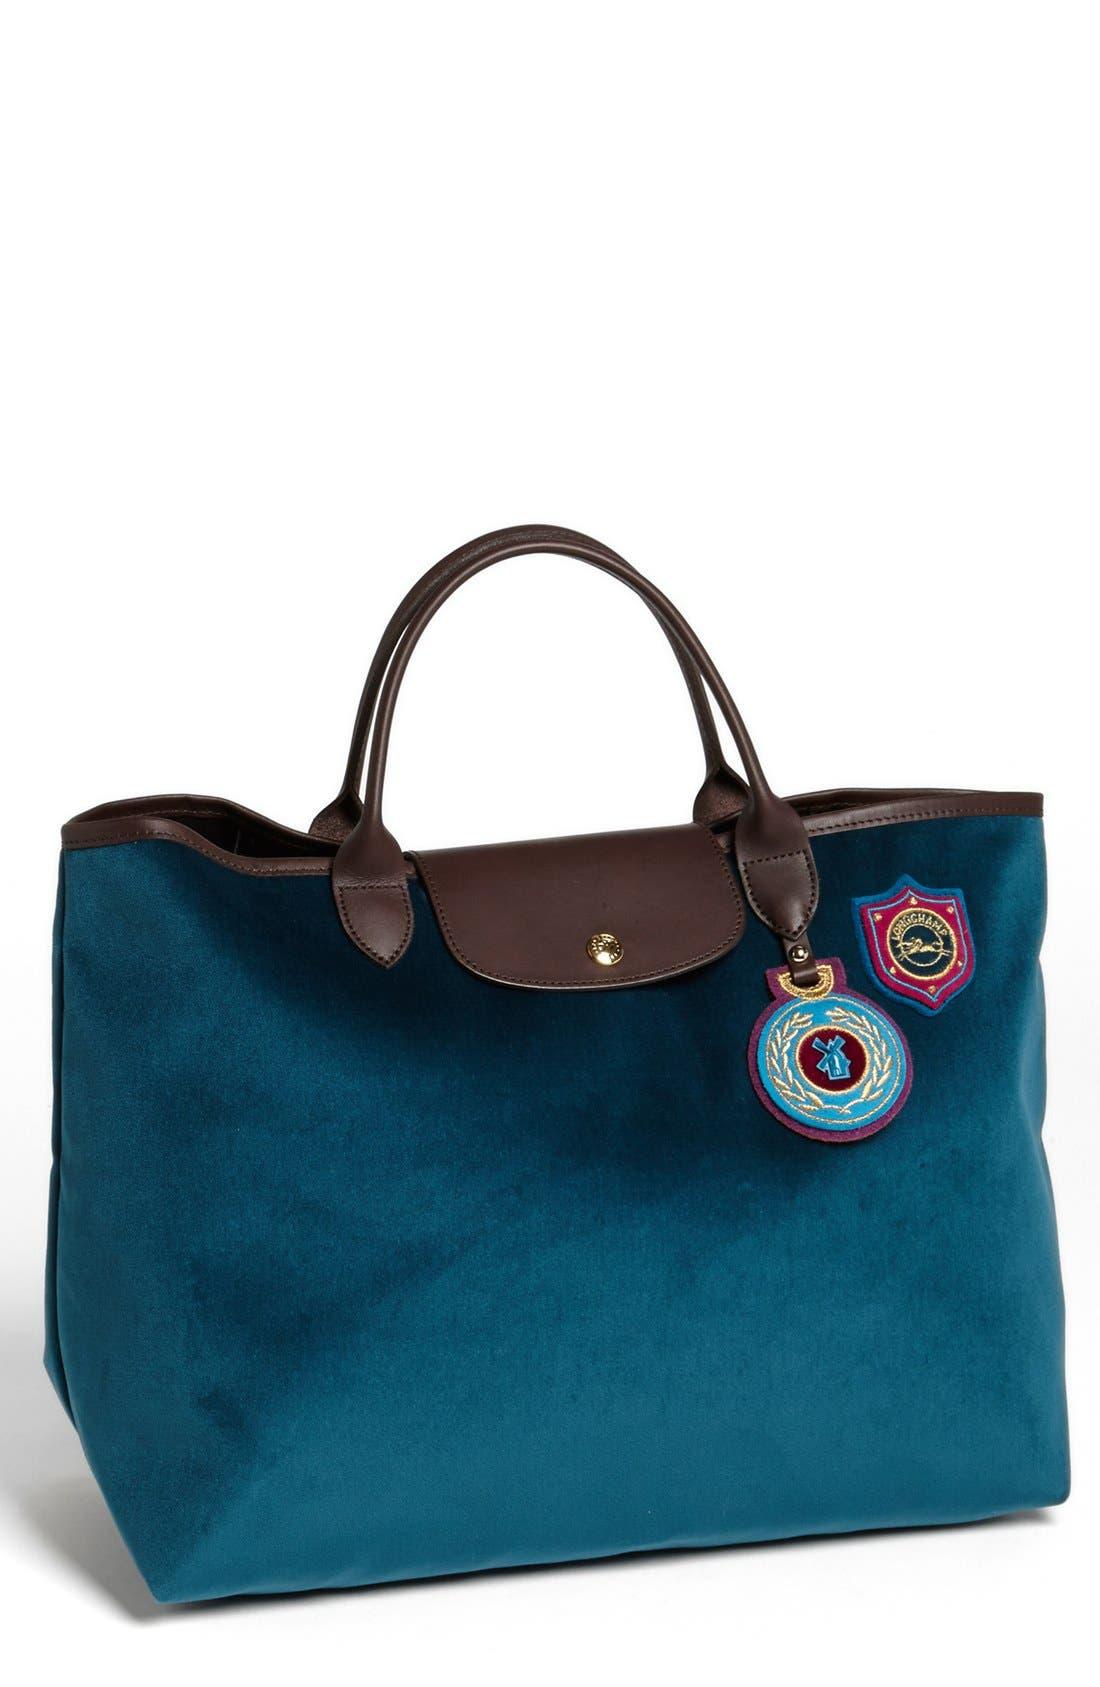 Main Image - Longchamp 'Funtaisy' Tote